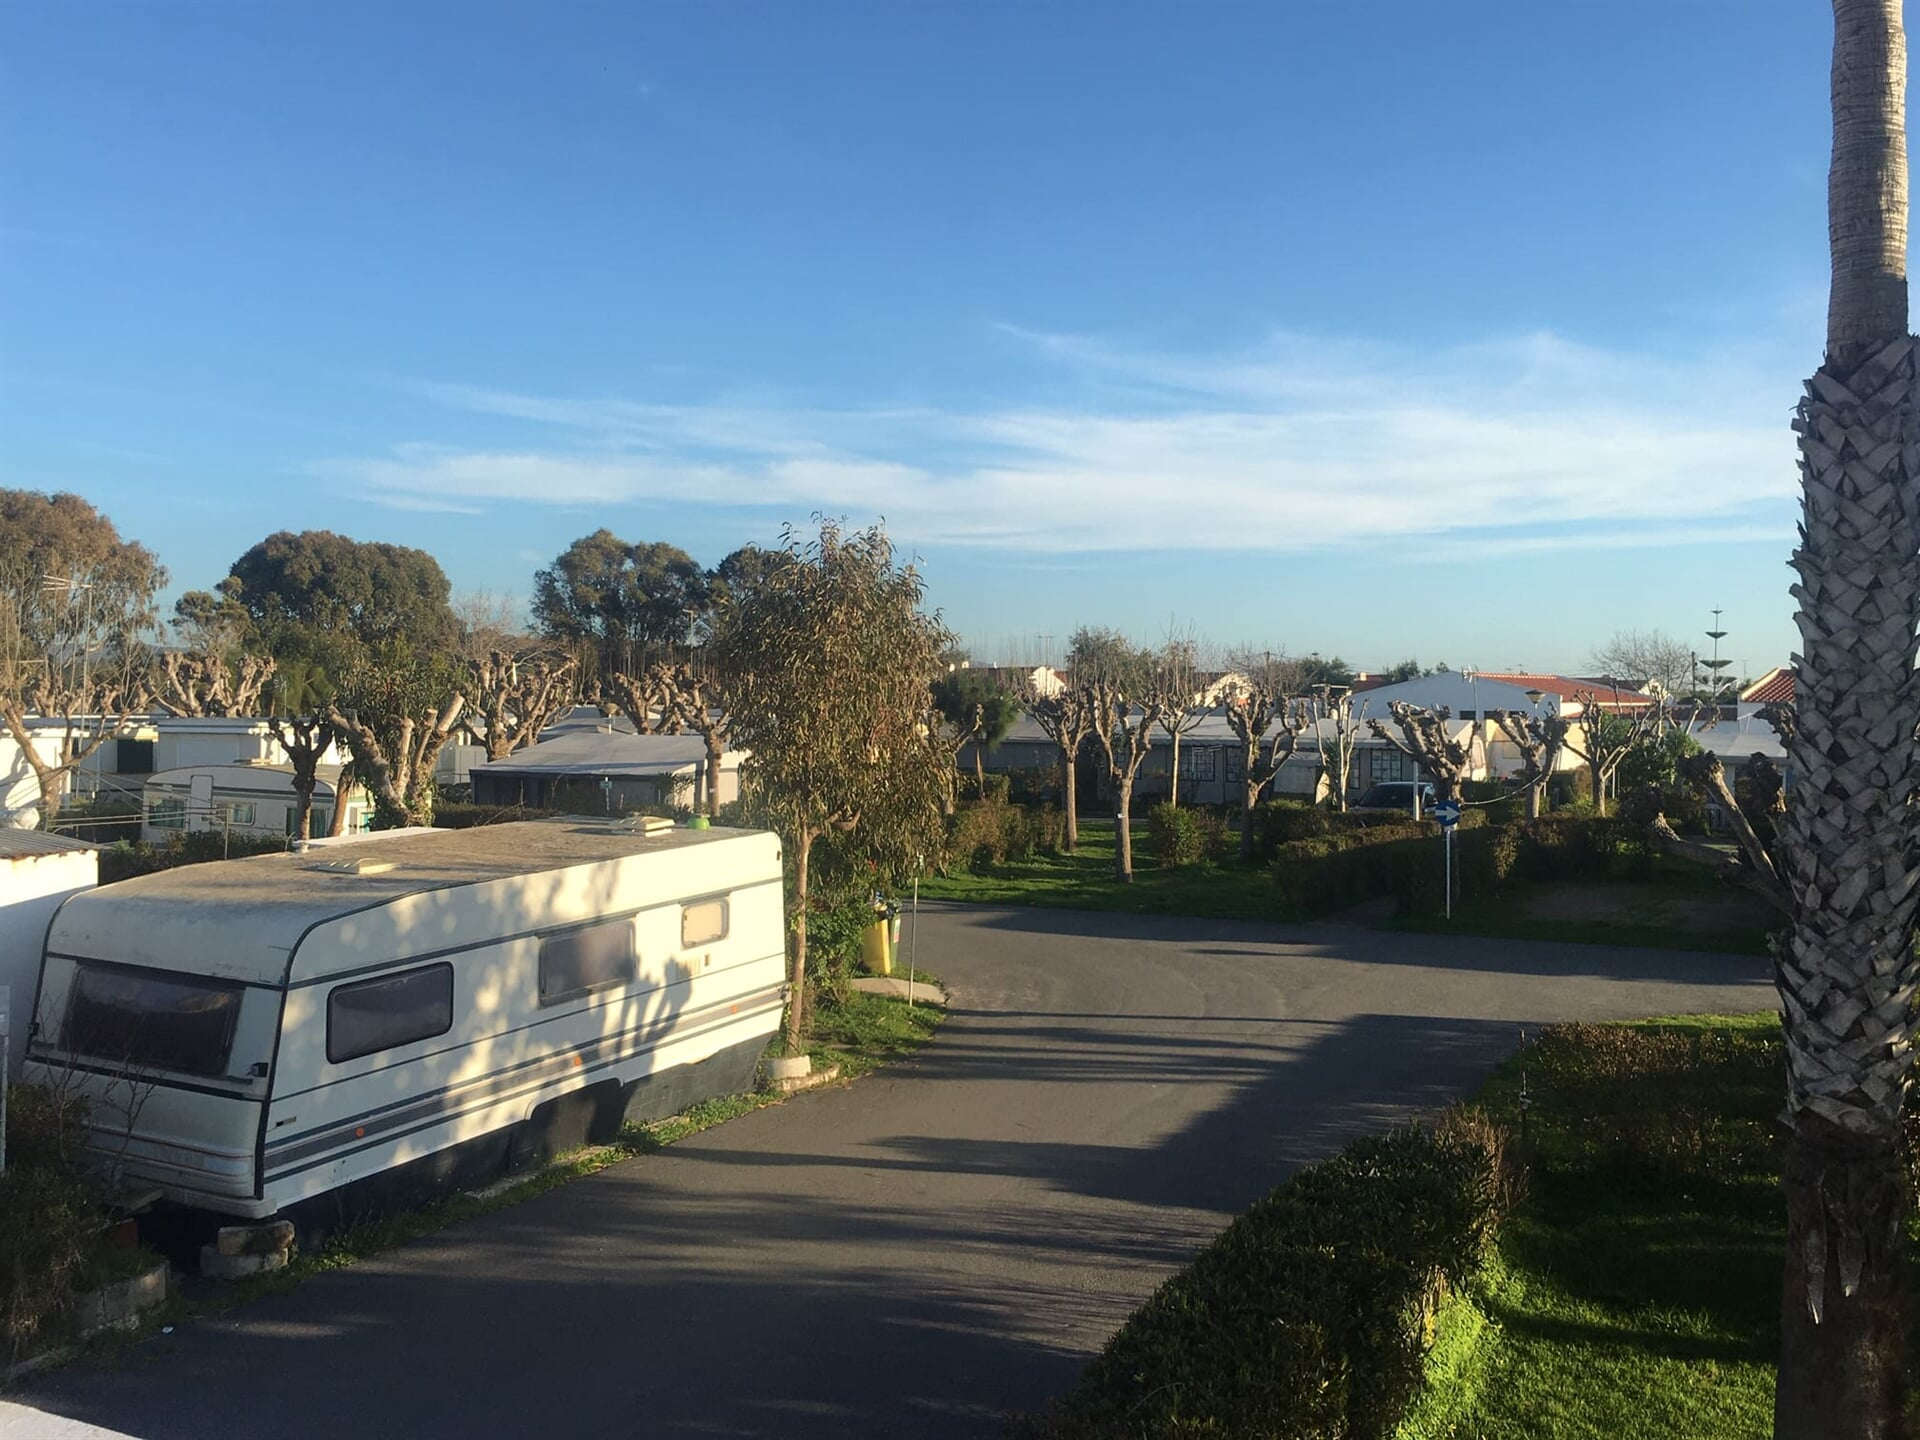 Parque de Campismo de Porto Covo